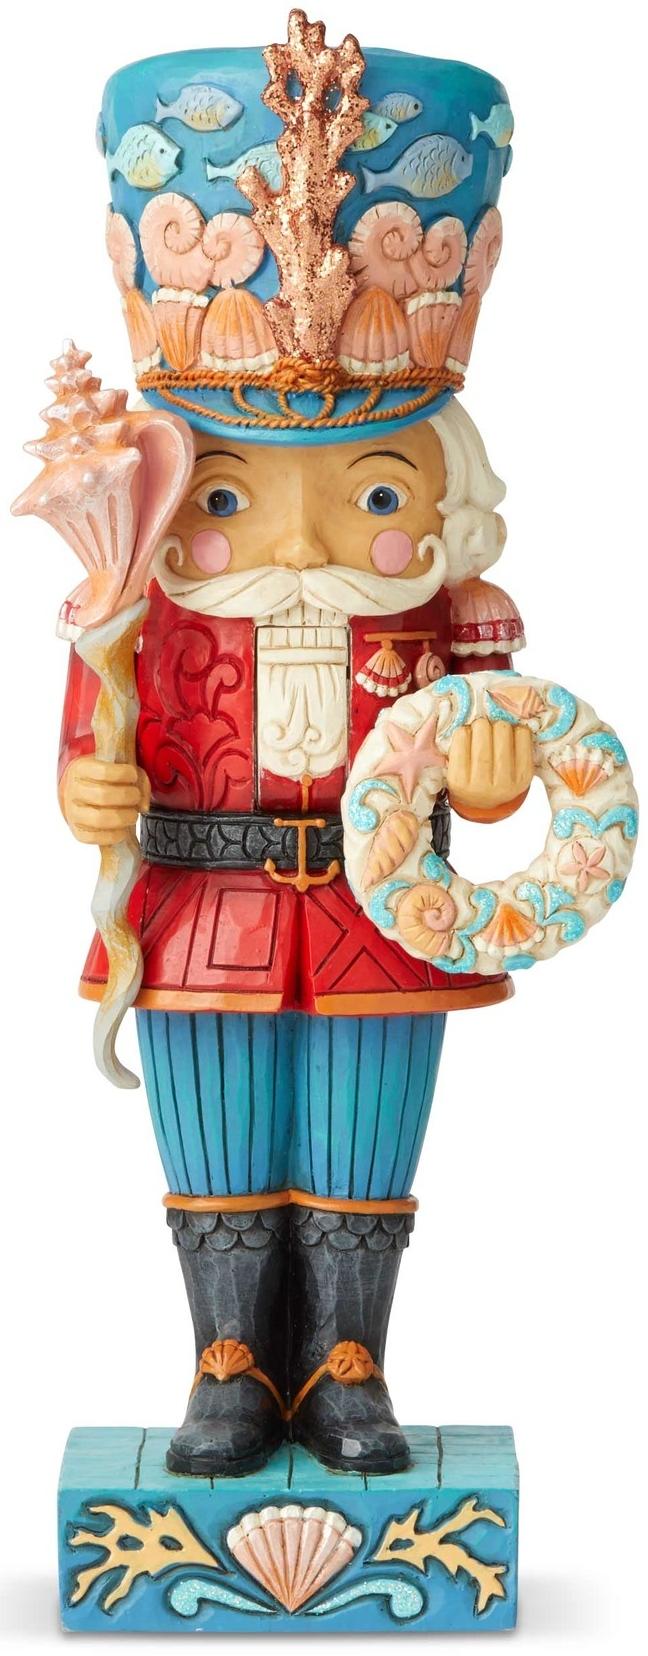 Jim Shore 6004027 Coastal Nutcracker Figurine